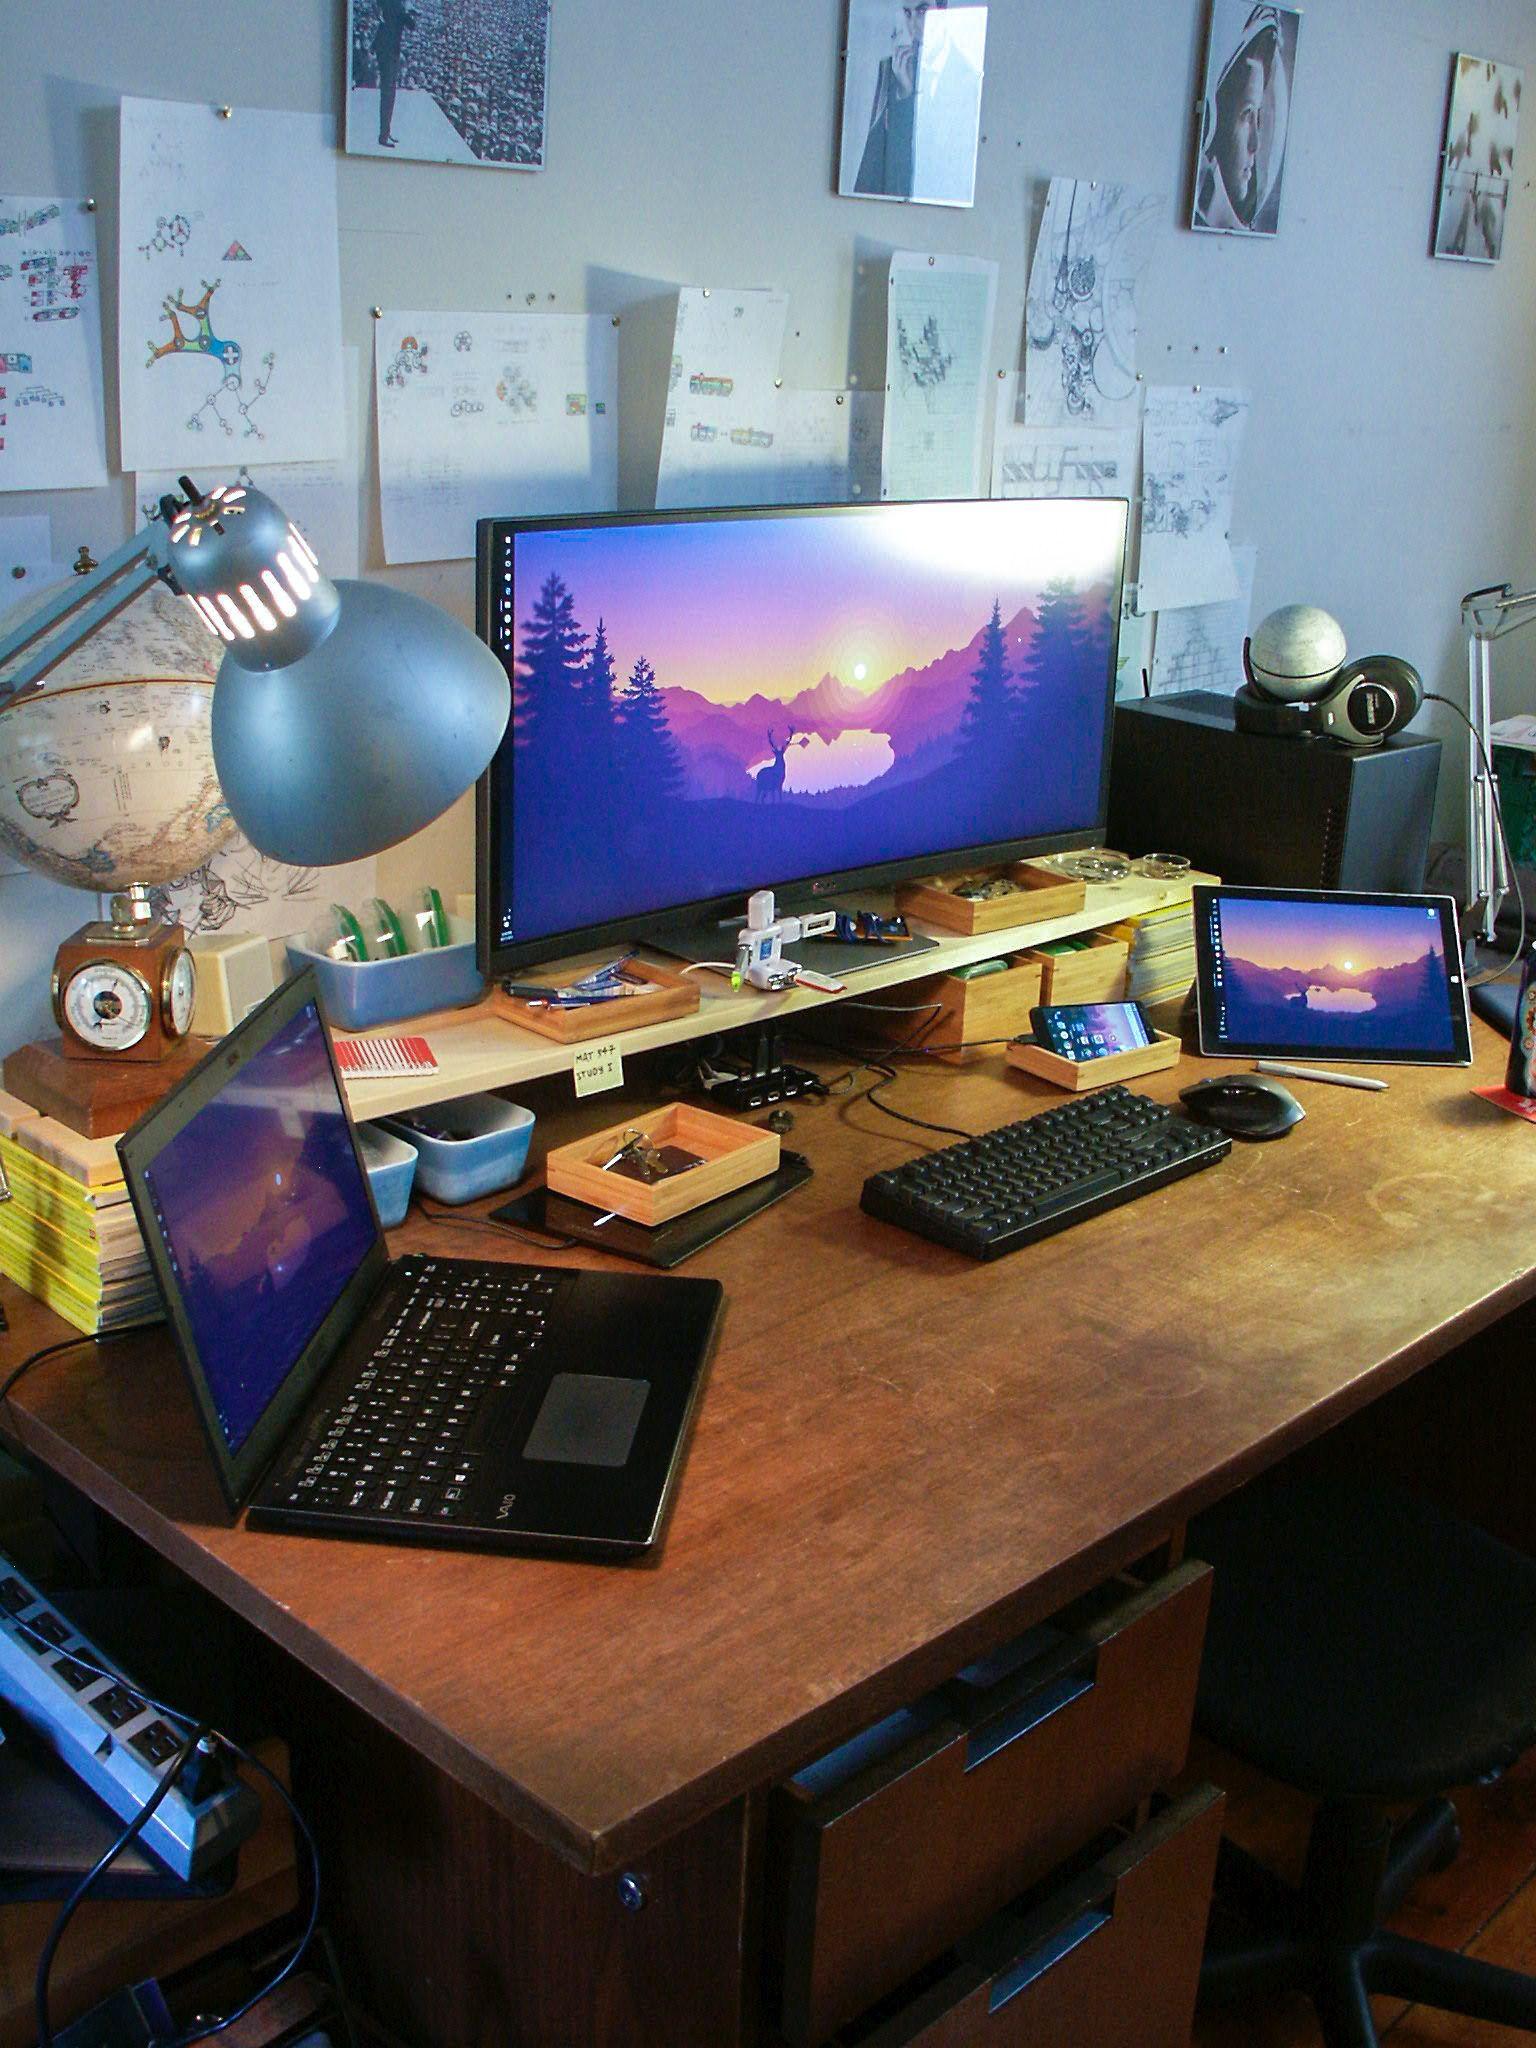 1440P Ultrawide Mini-ITX Xeon Workstation + Gaming - Album on Imgur